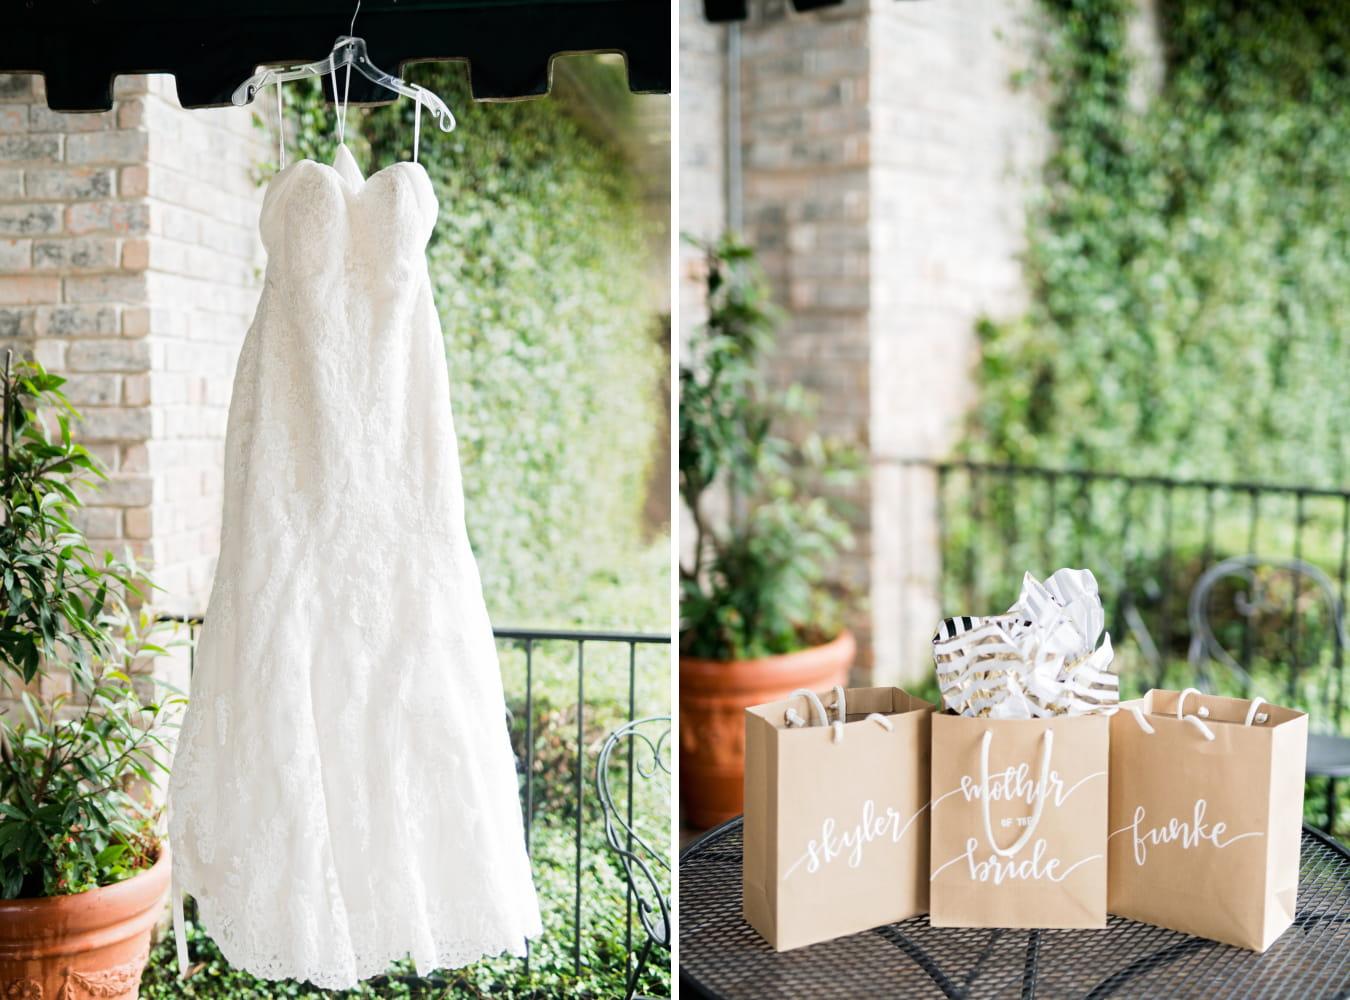 Houston Wedding- Pharris Photography- Details- Kristin + Robert- Wedding Dress- Gifts